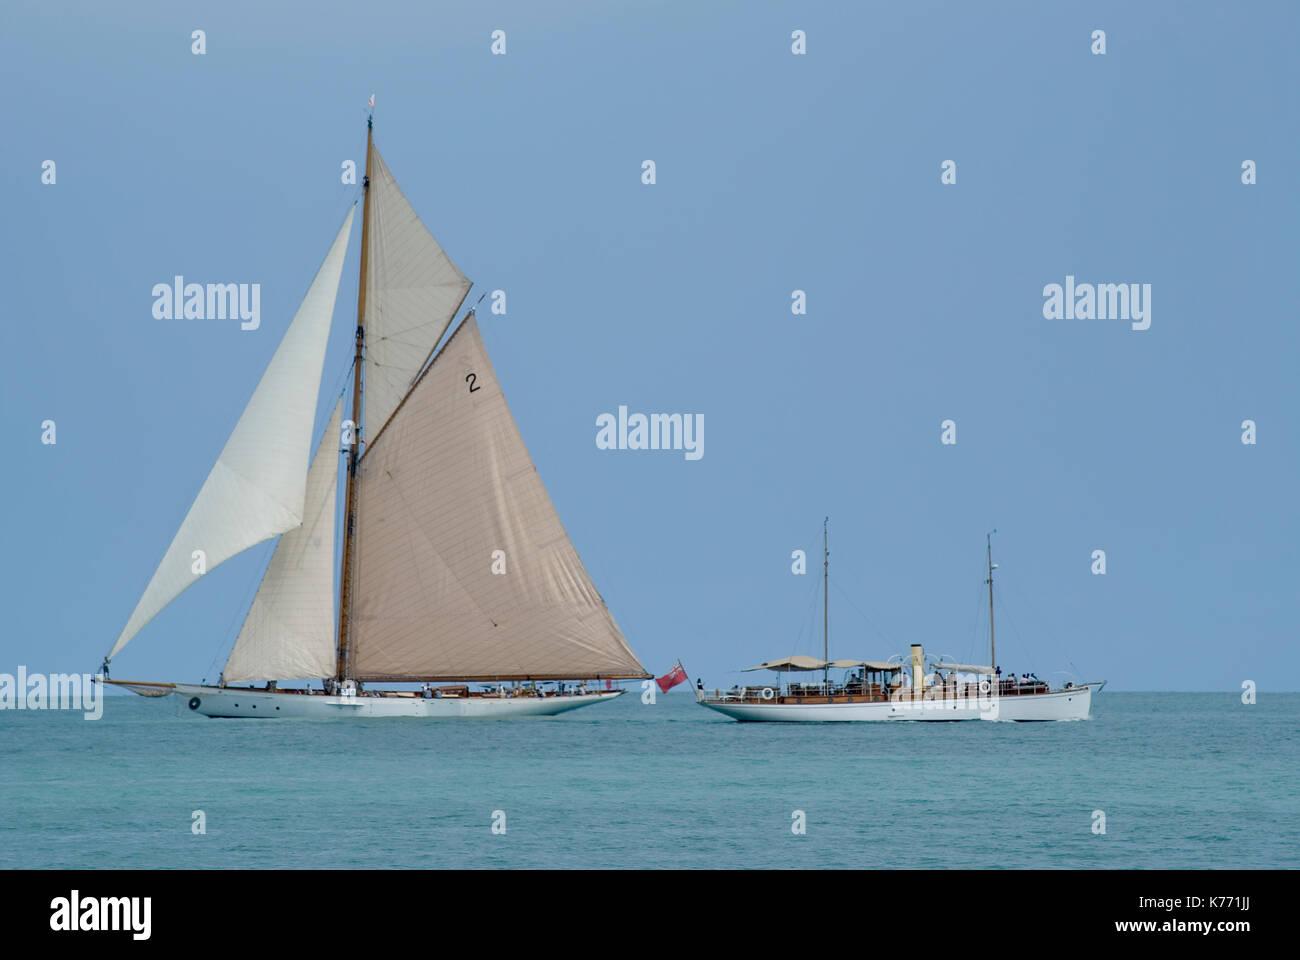 Ancient Riviera yachts cruising in mediterranean sea - Stock Image